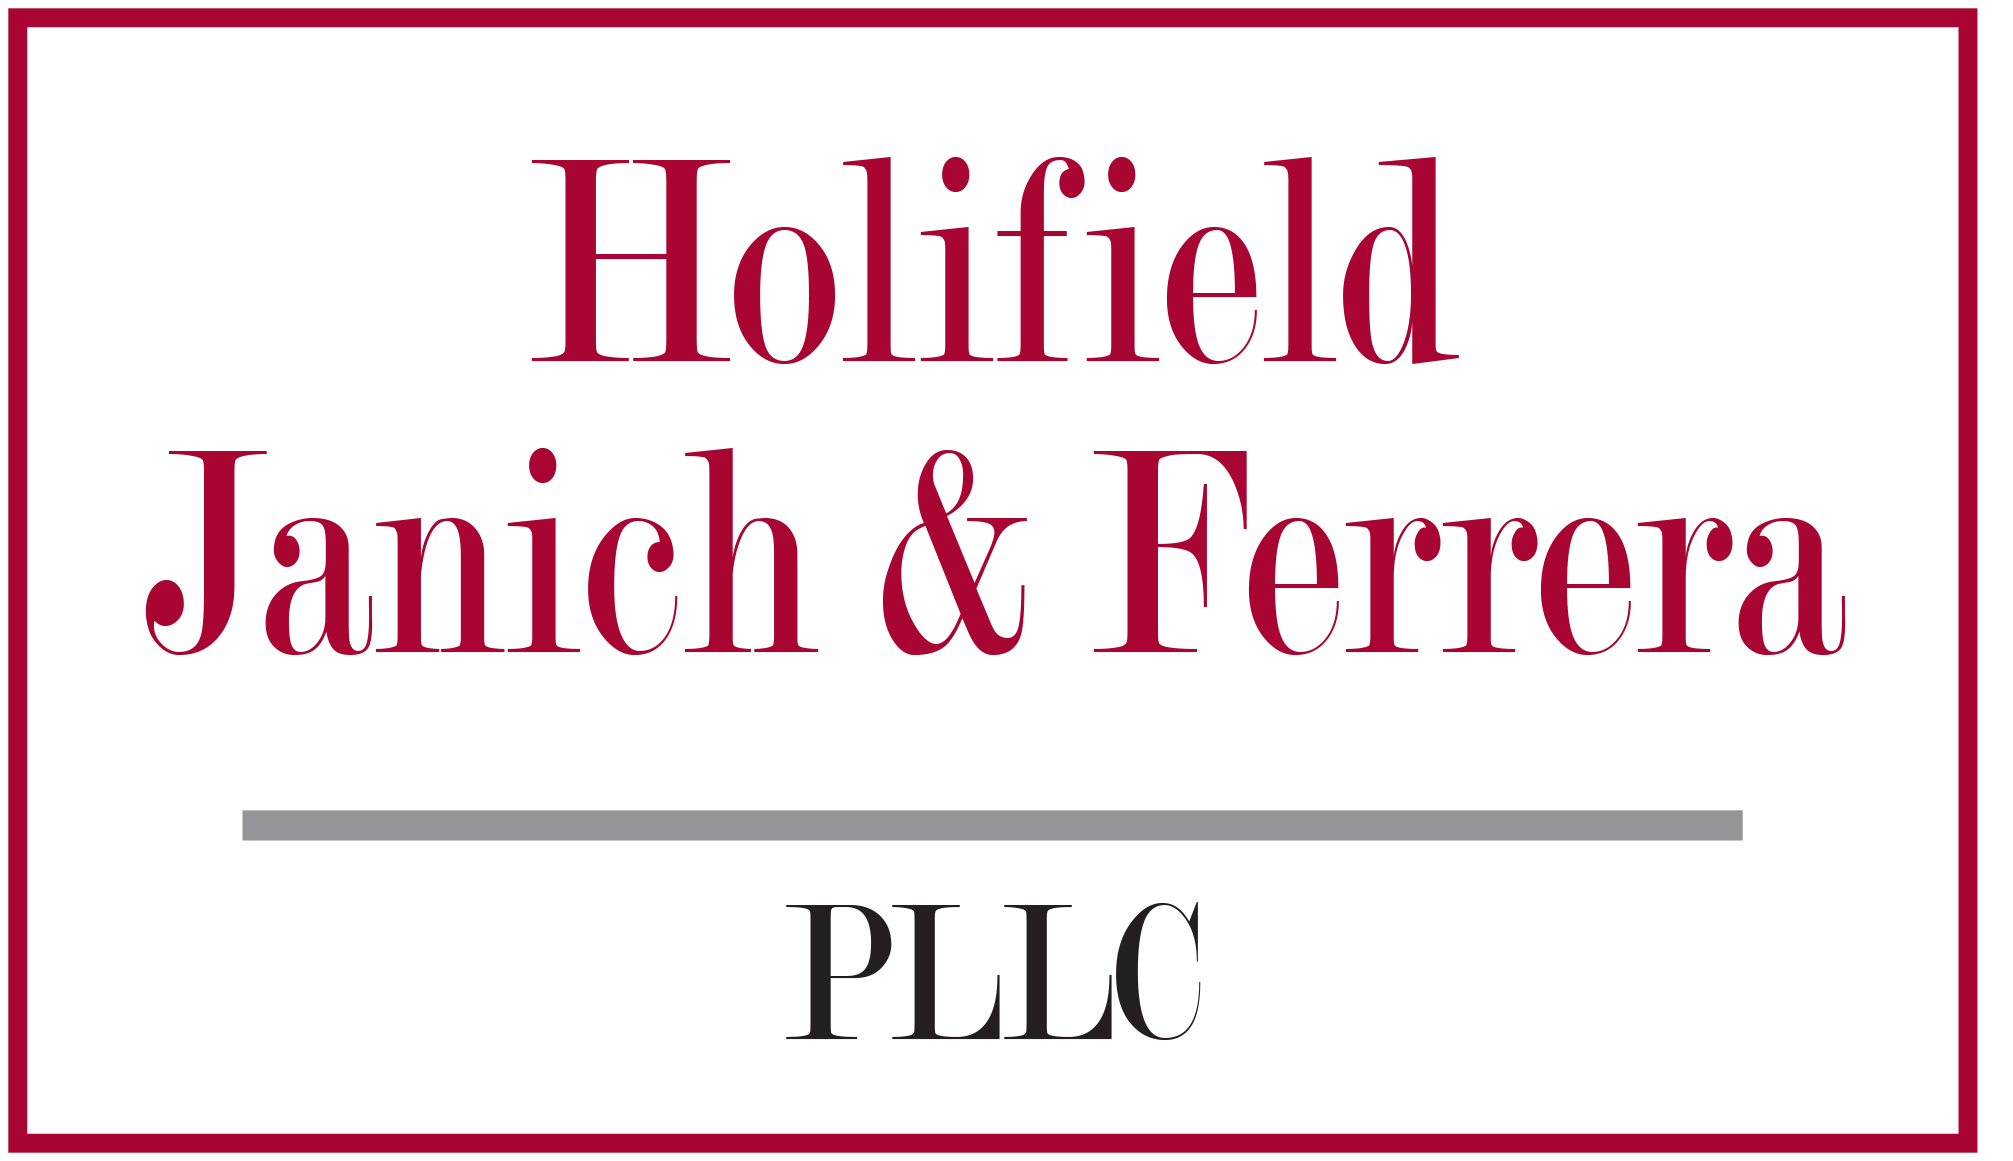 Holifield Janich & Ferrera, PLLC